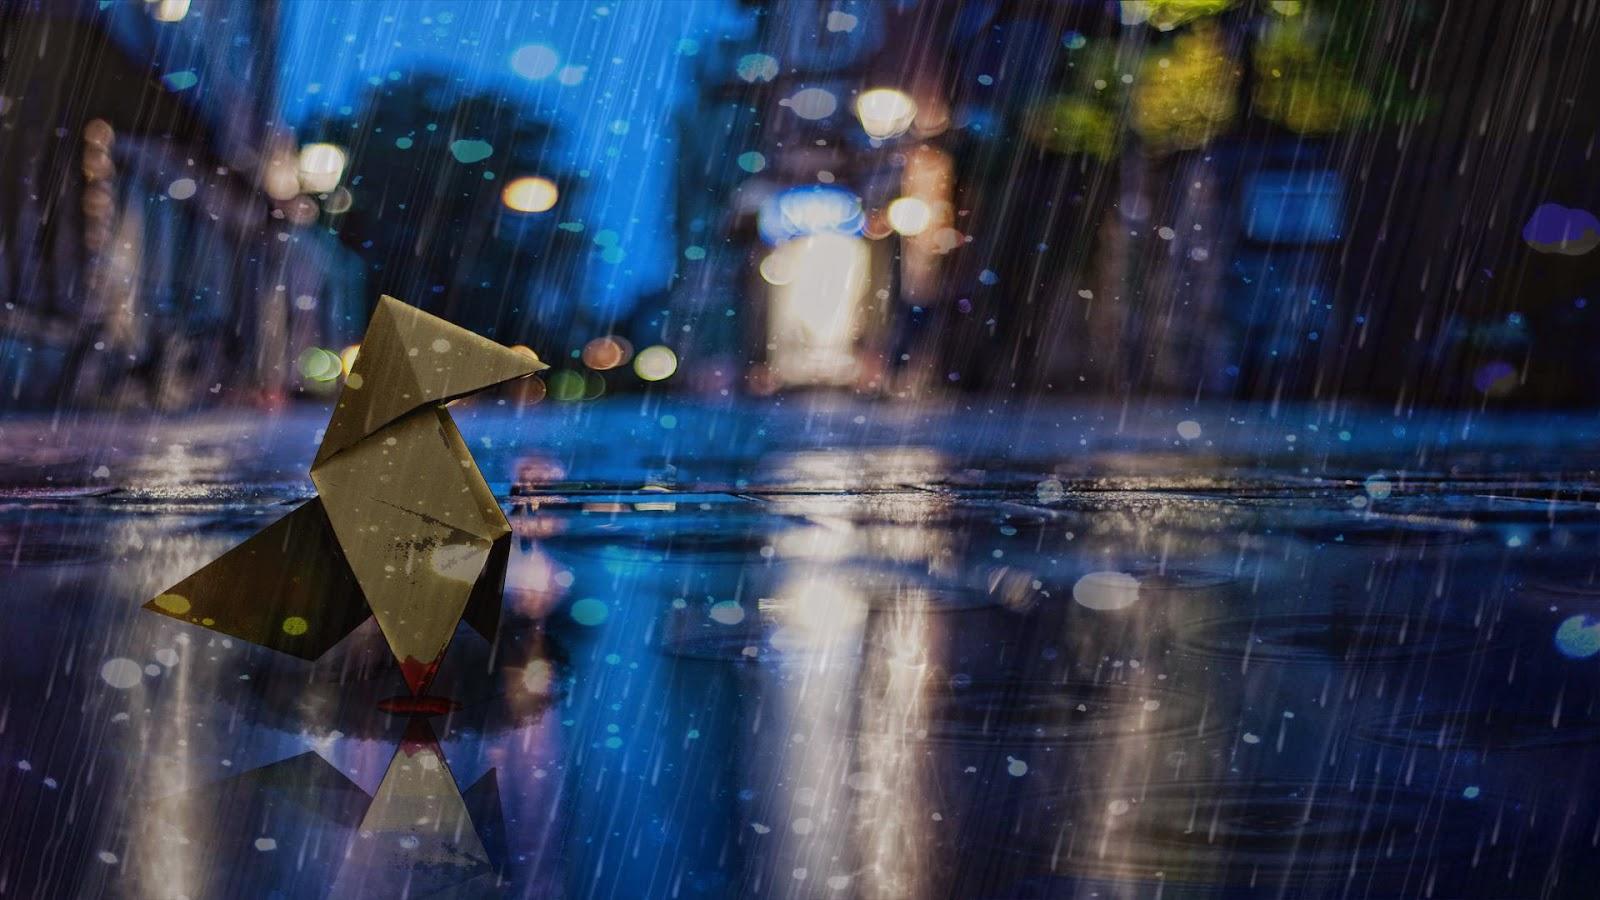 Rainy Season Hd Wallpapers 2015 20 Top Rainy Season Nice